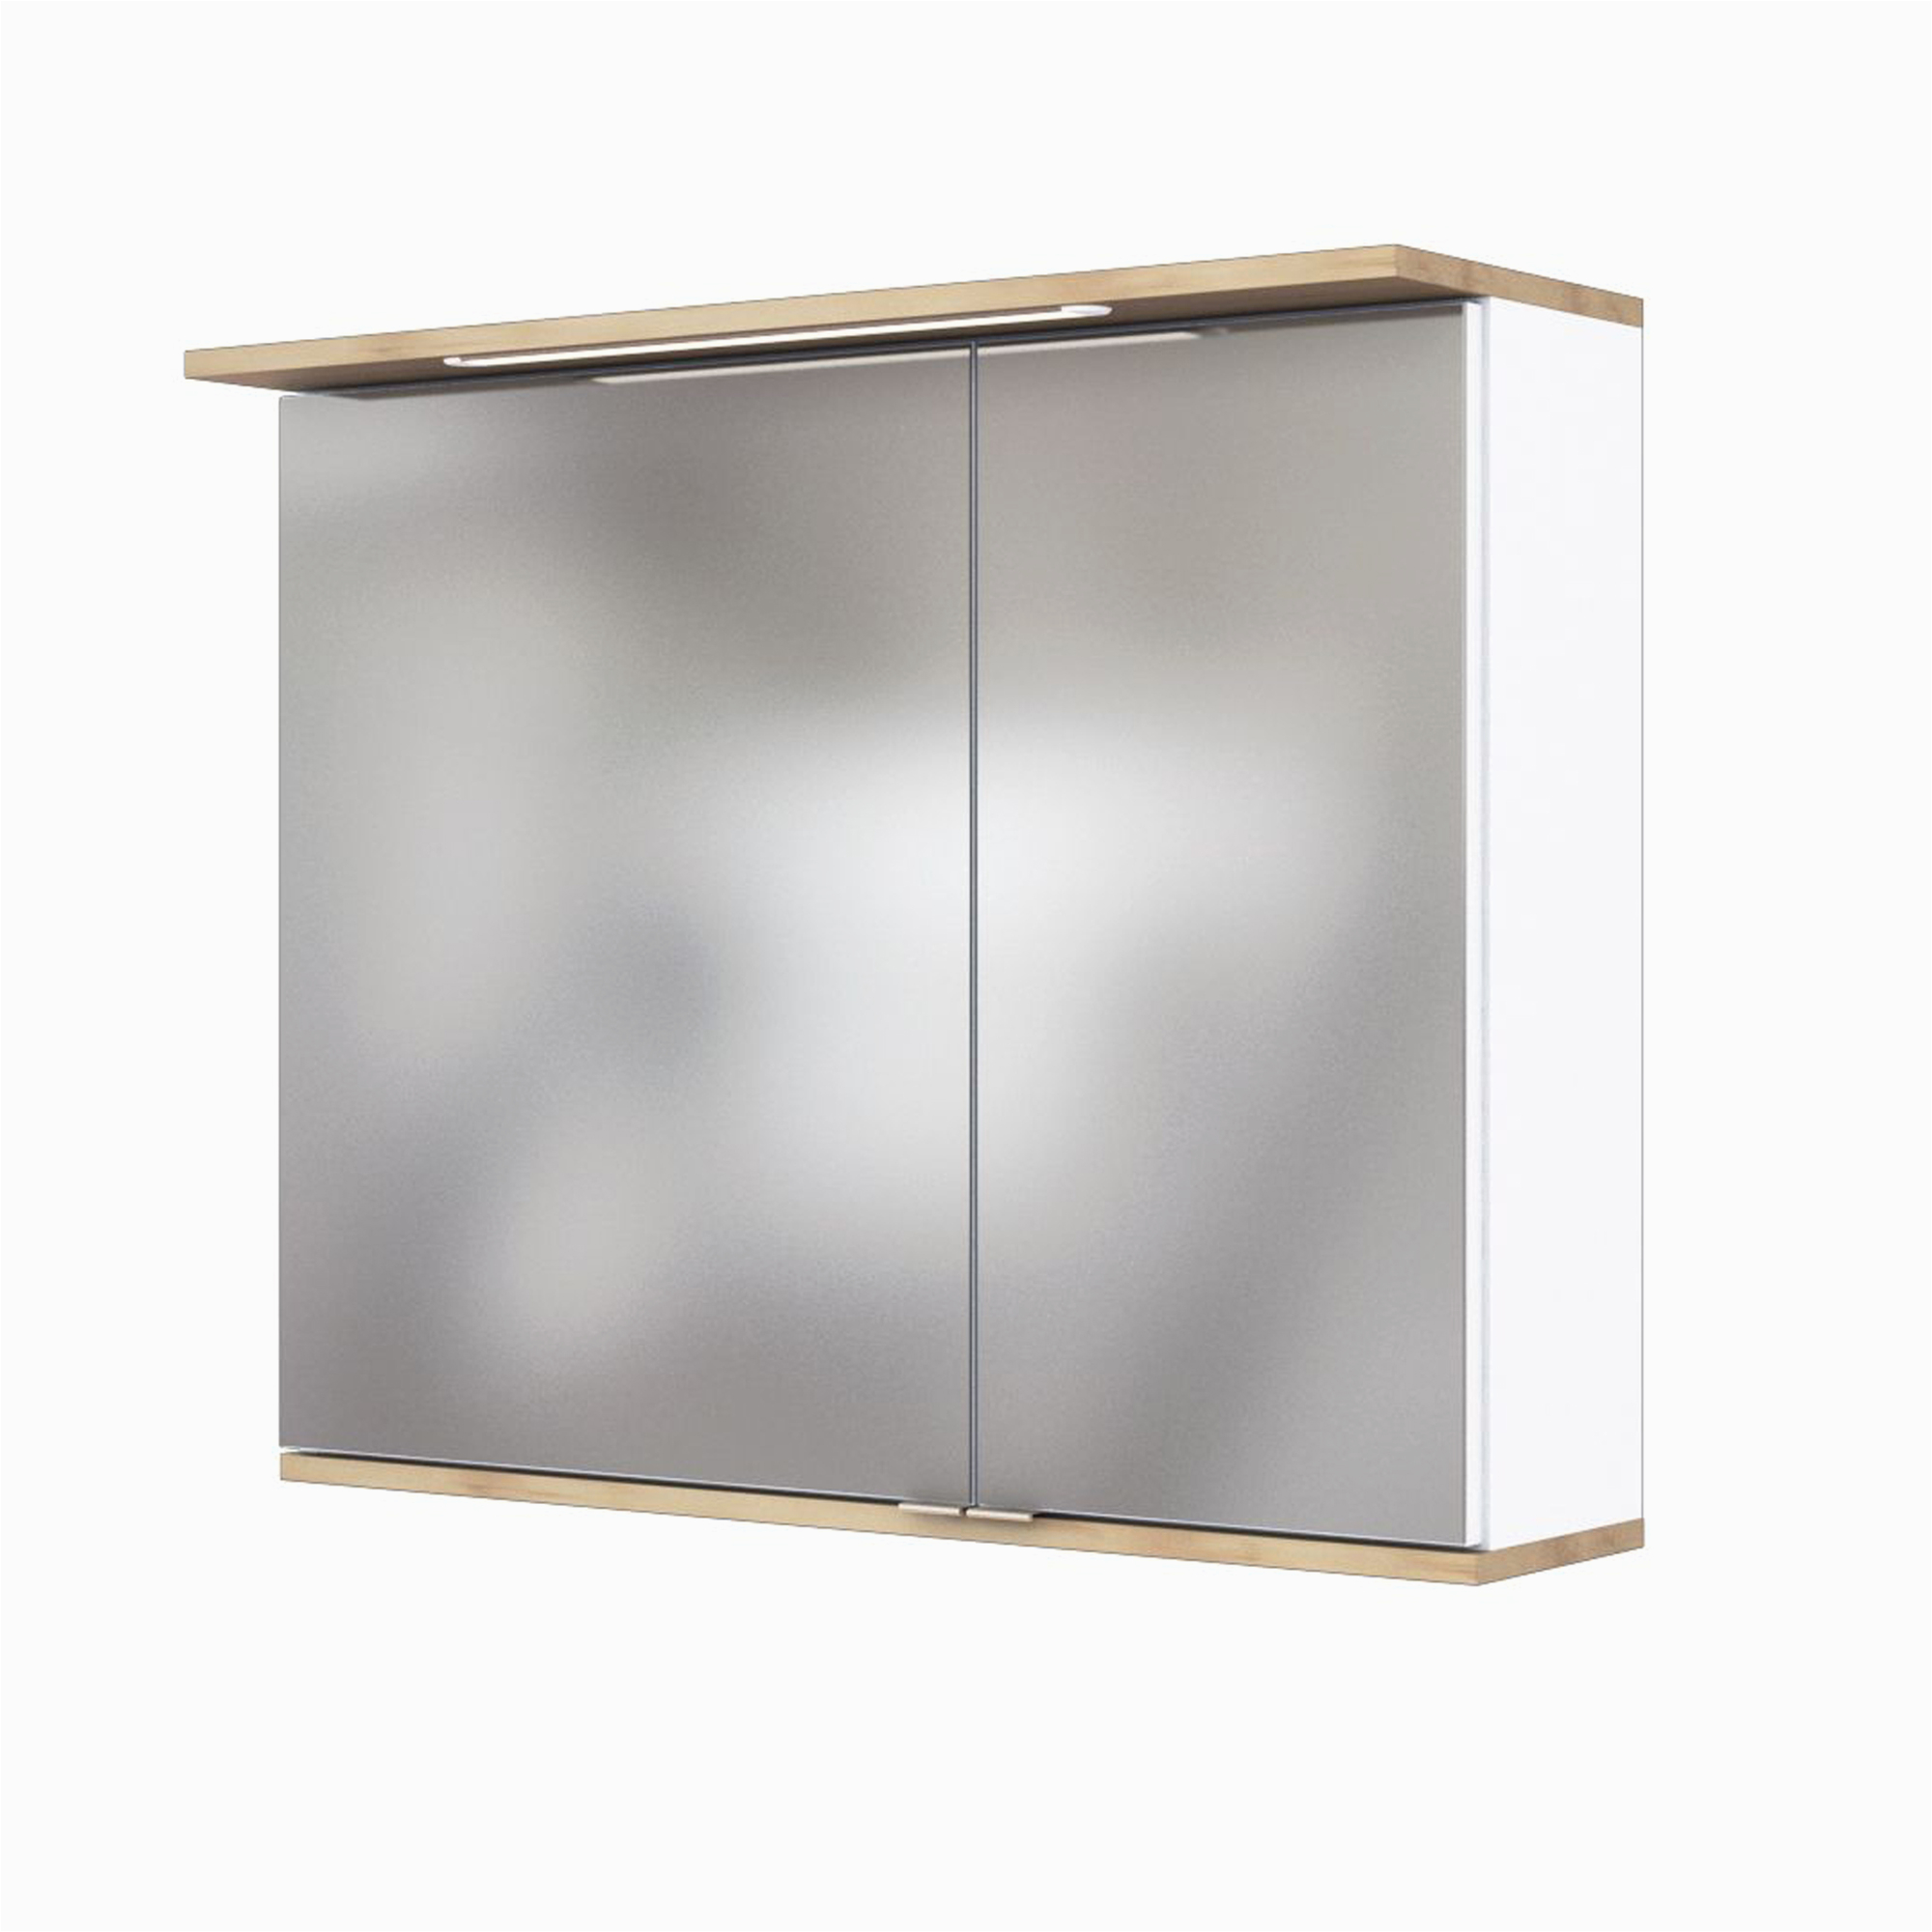 Badezimmerschrank Jumbo Spiegelschrank Badezimmer Jumbo